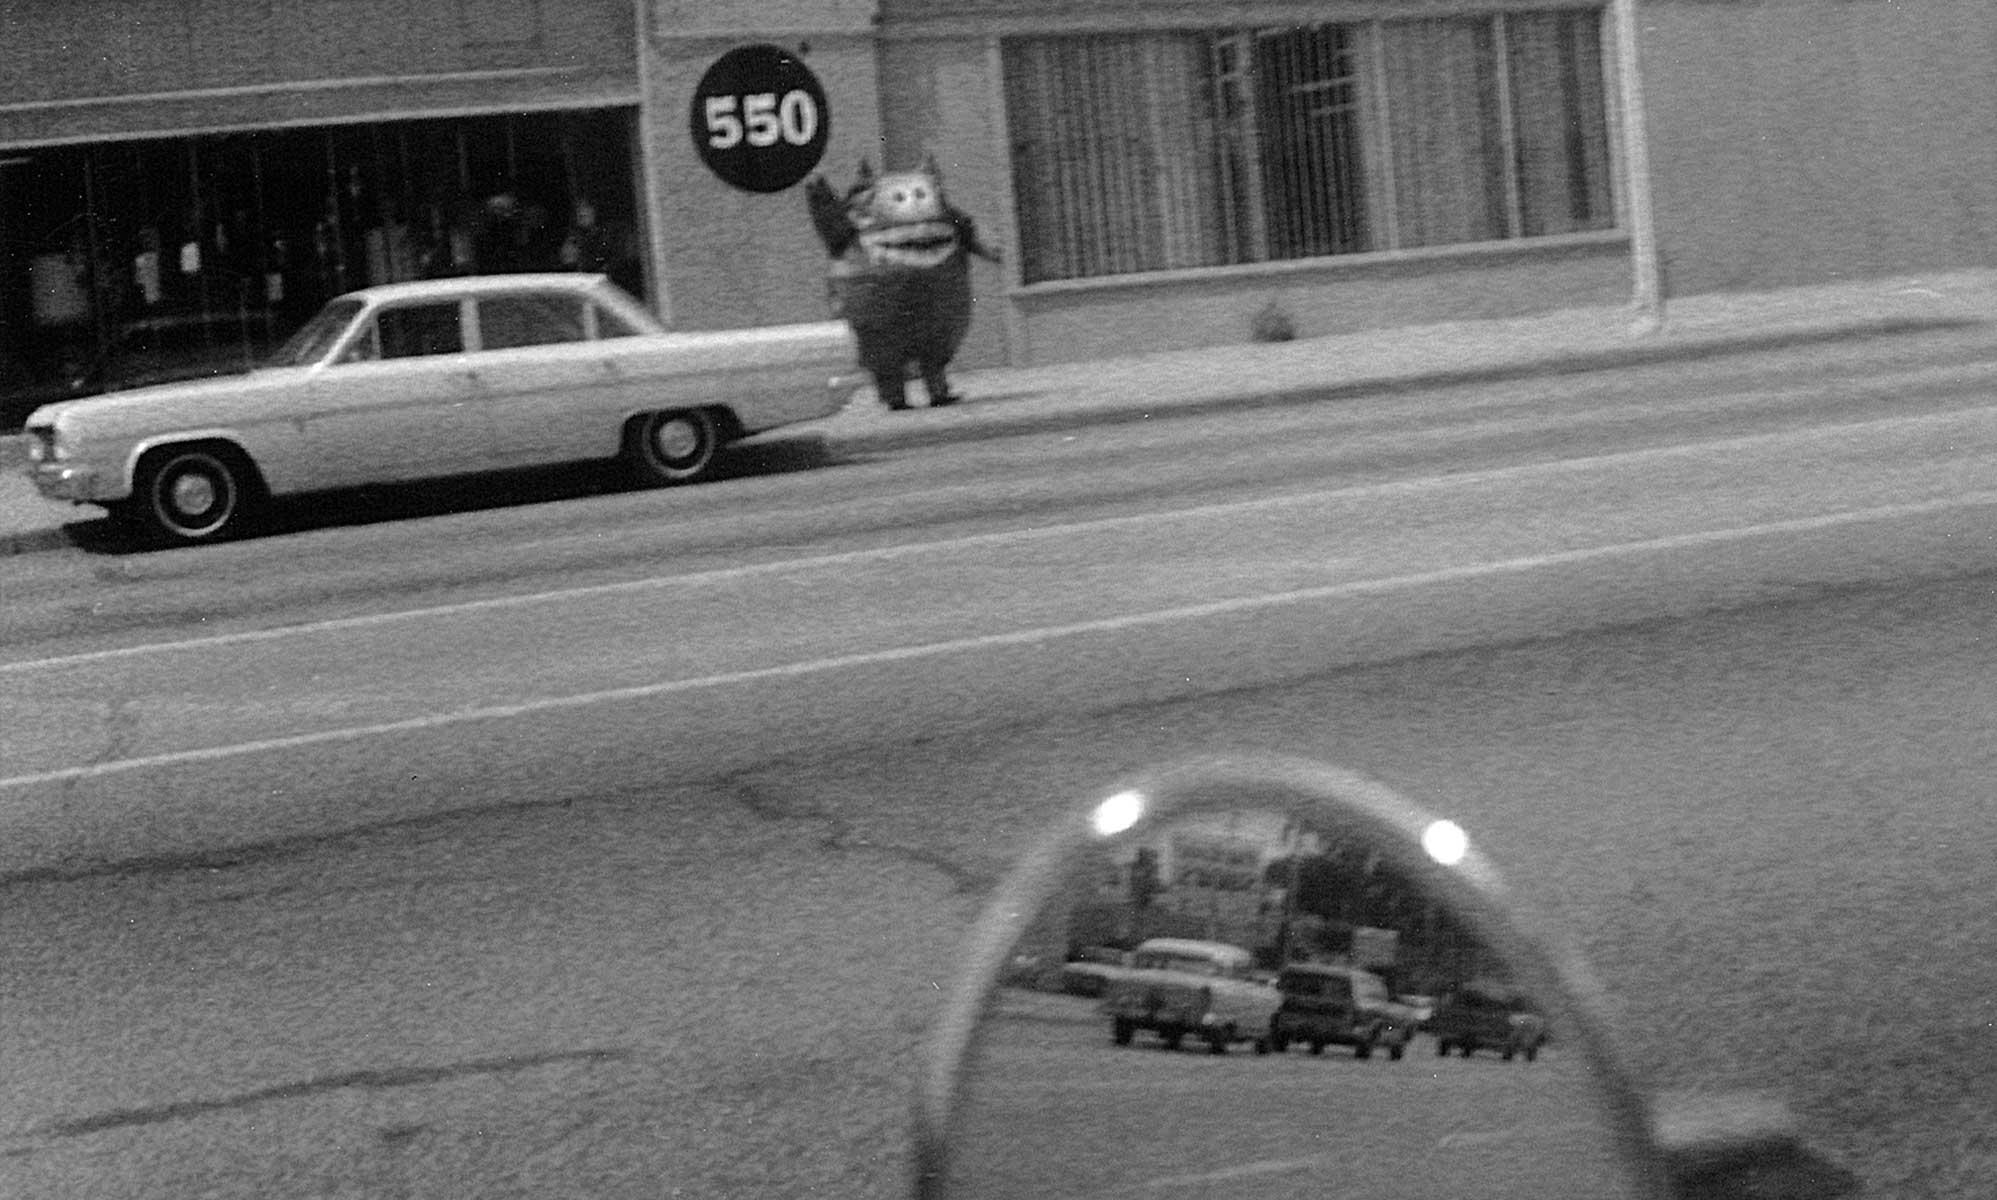 Nauga on the street